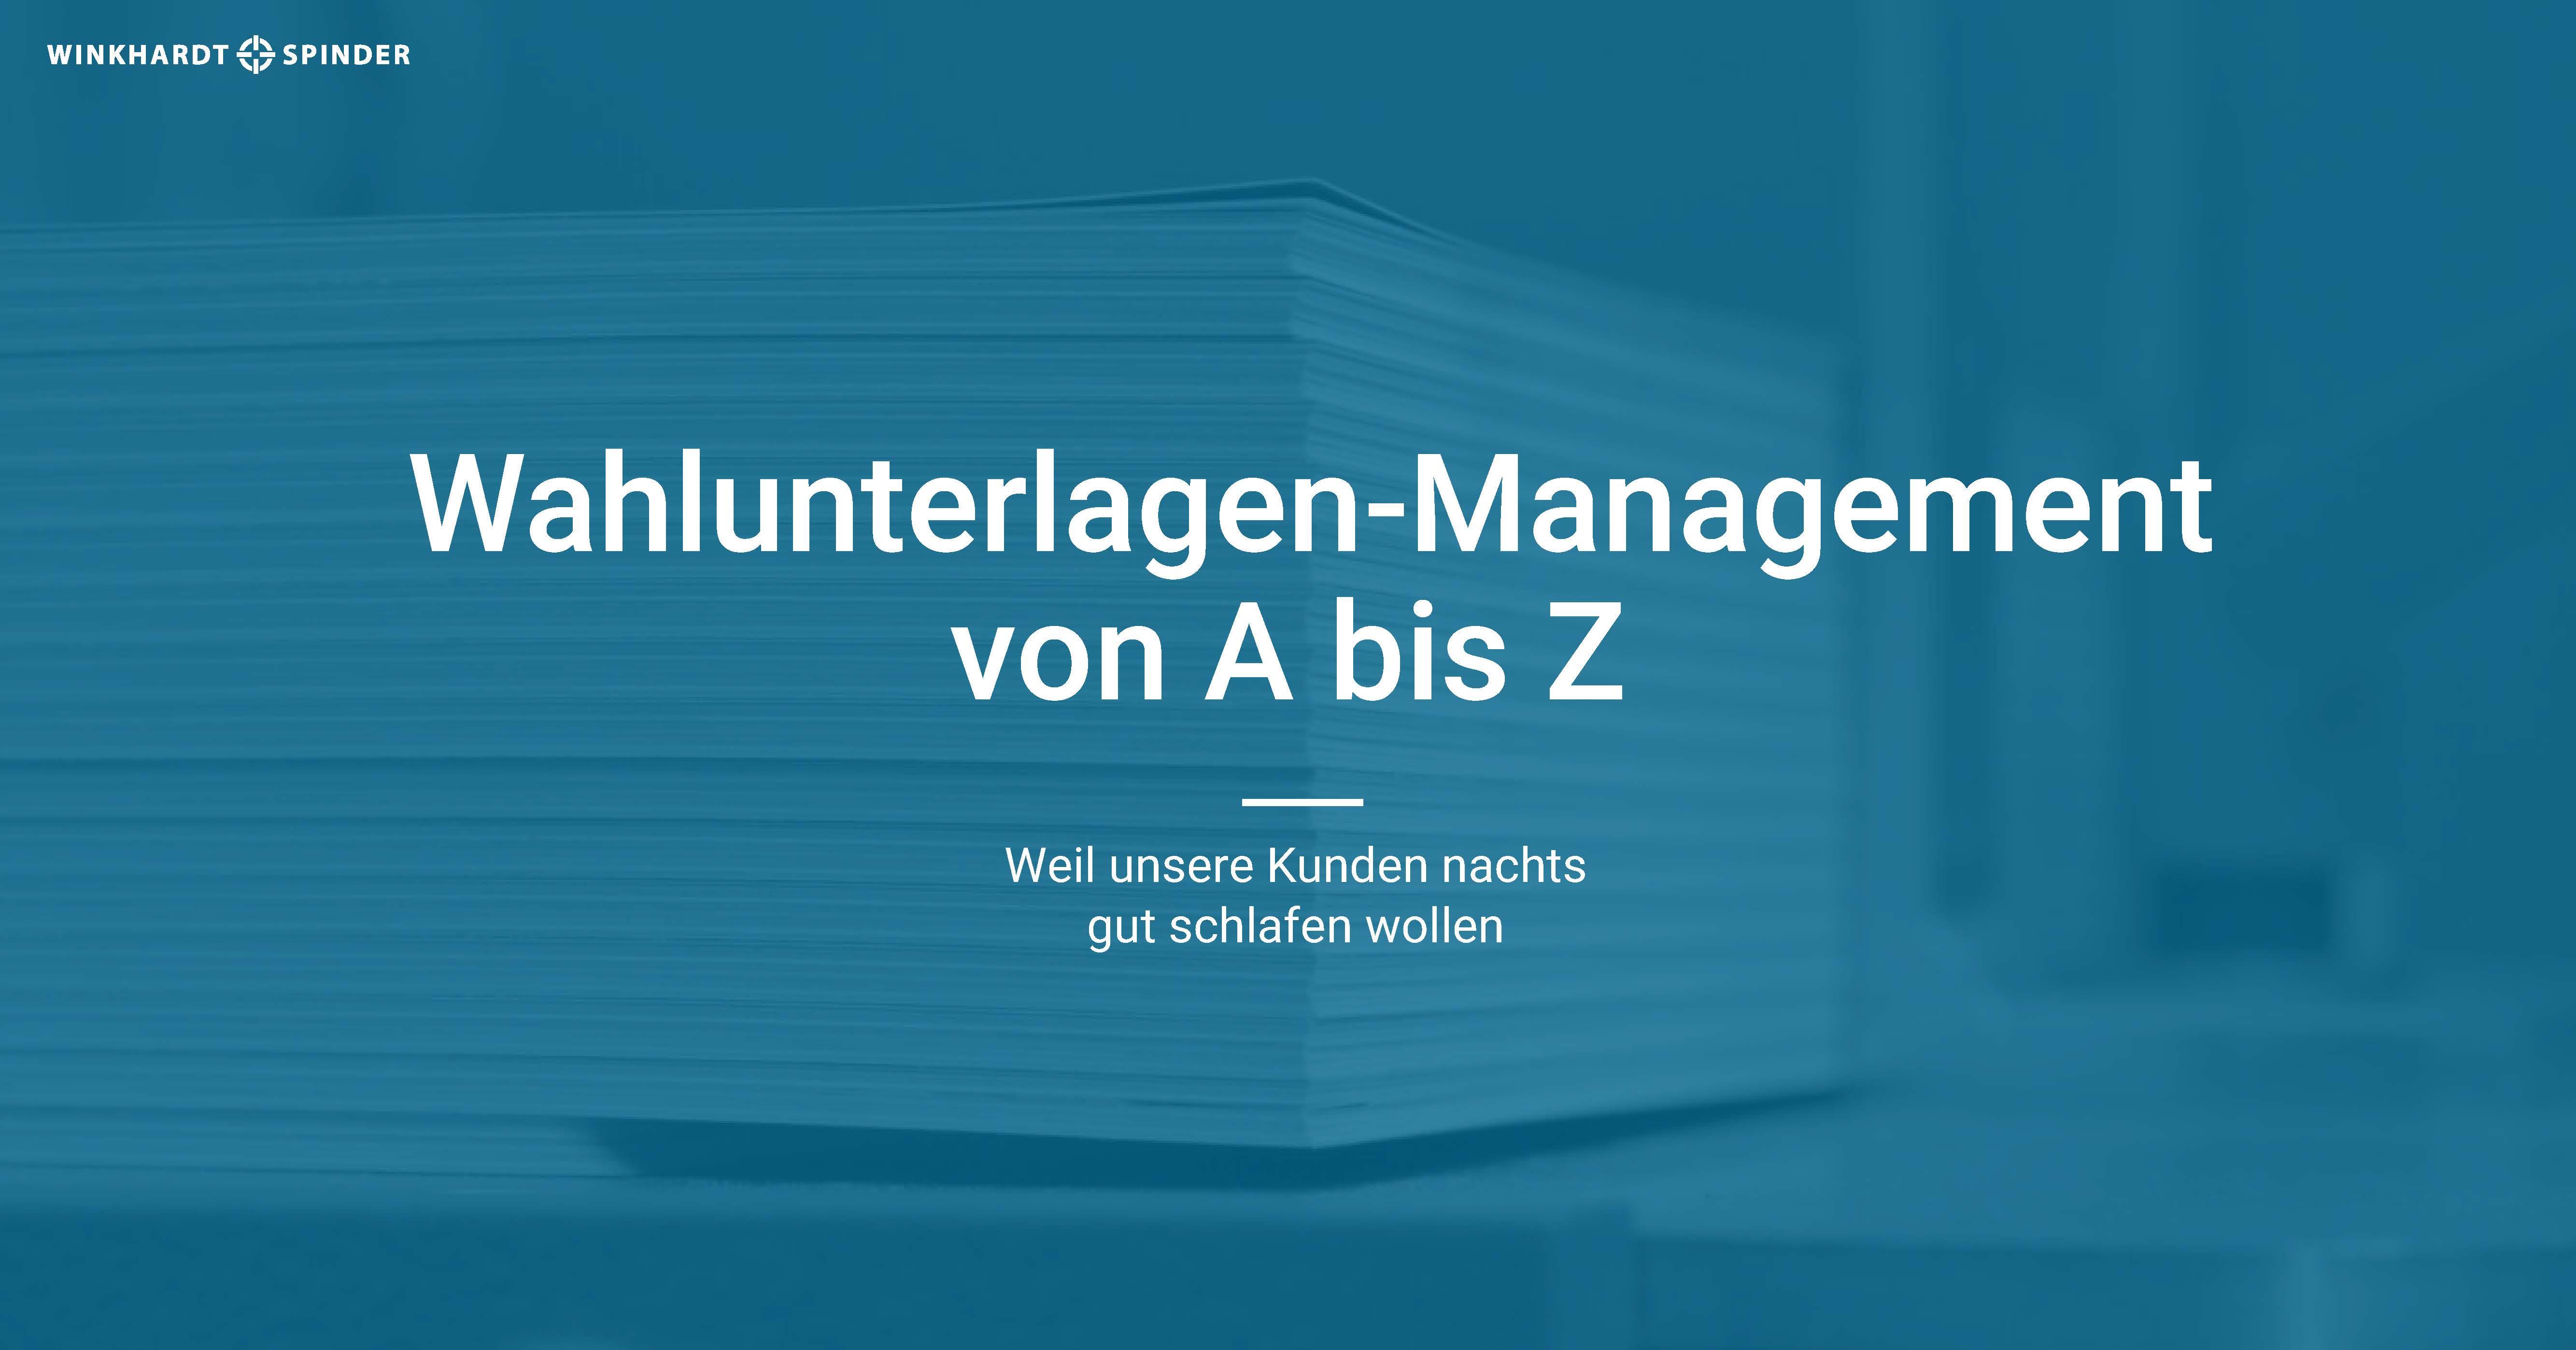 Winkhardt + Spinder GmbH & Co. KG